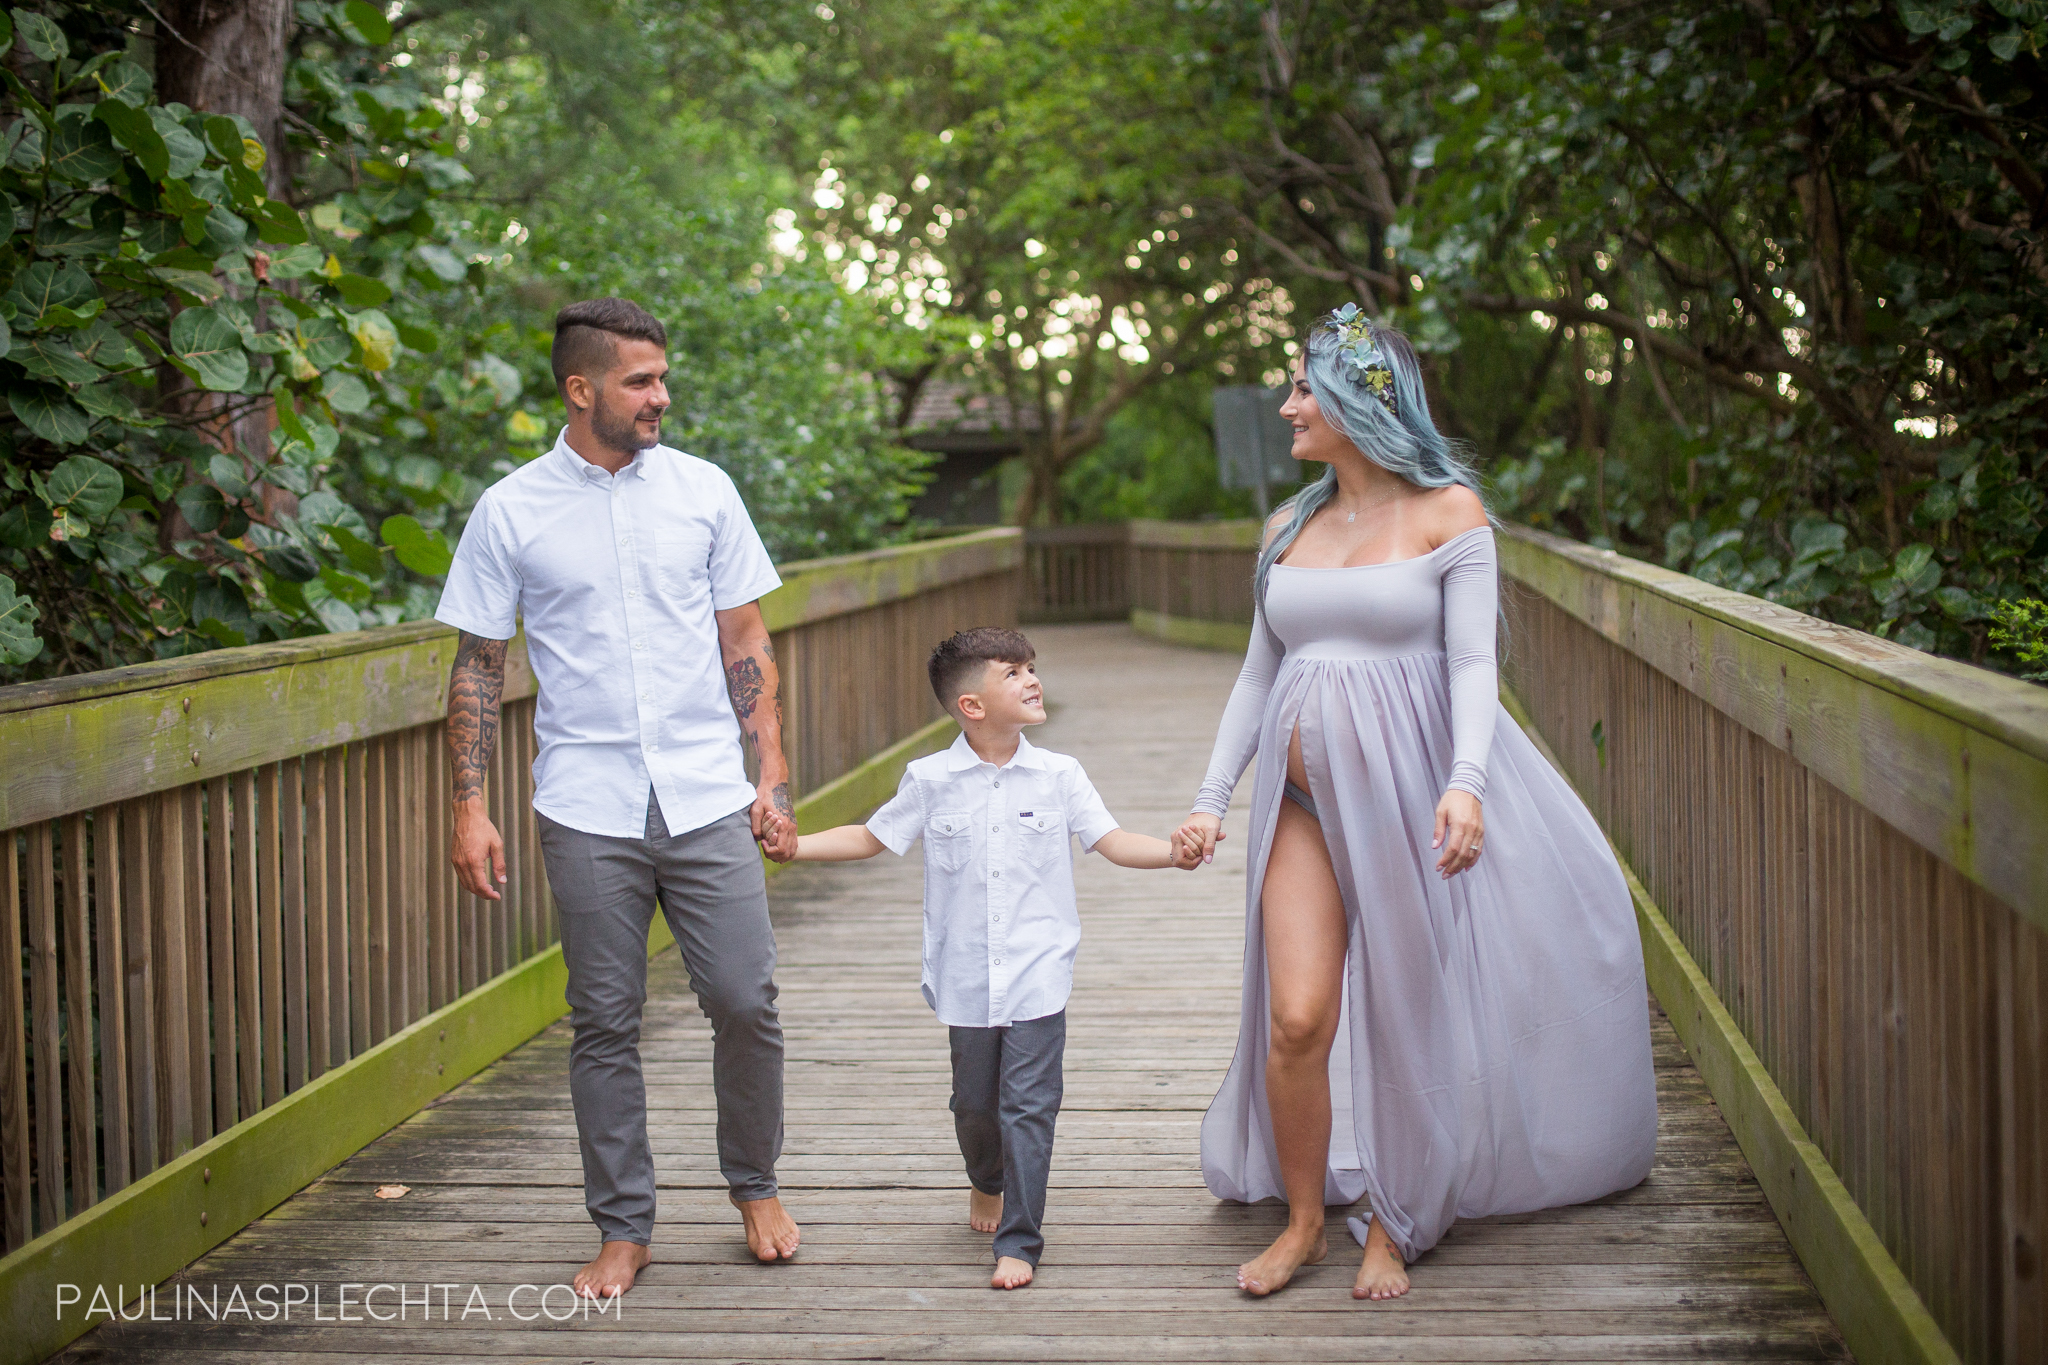 boca-regional-birth-photographer-toppel-center-post-partum-depression-ppd-raton-maternity-dress.jpg